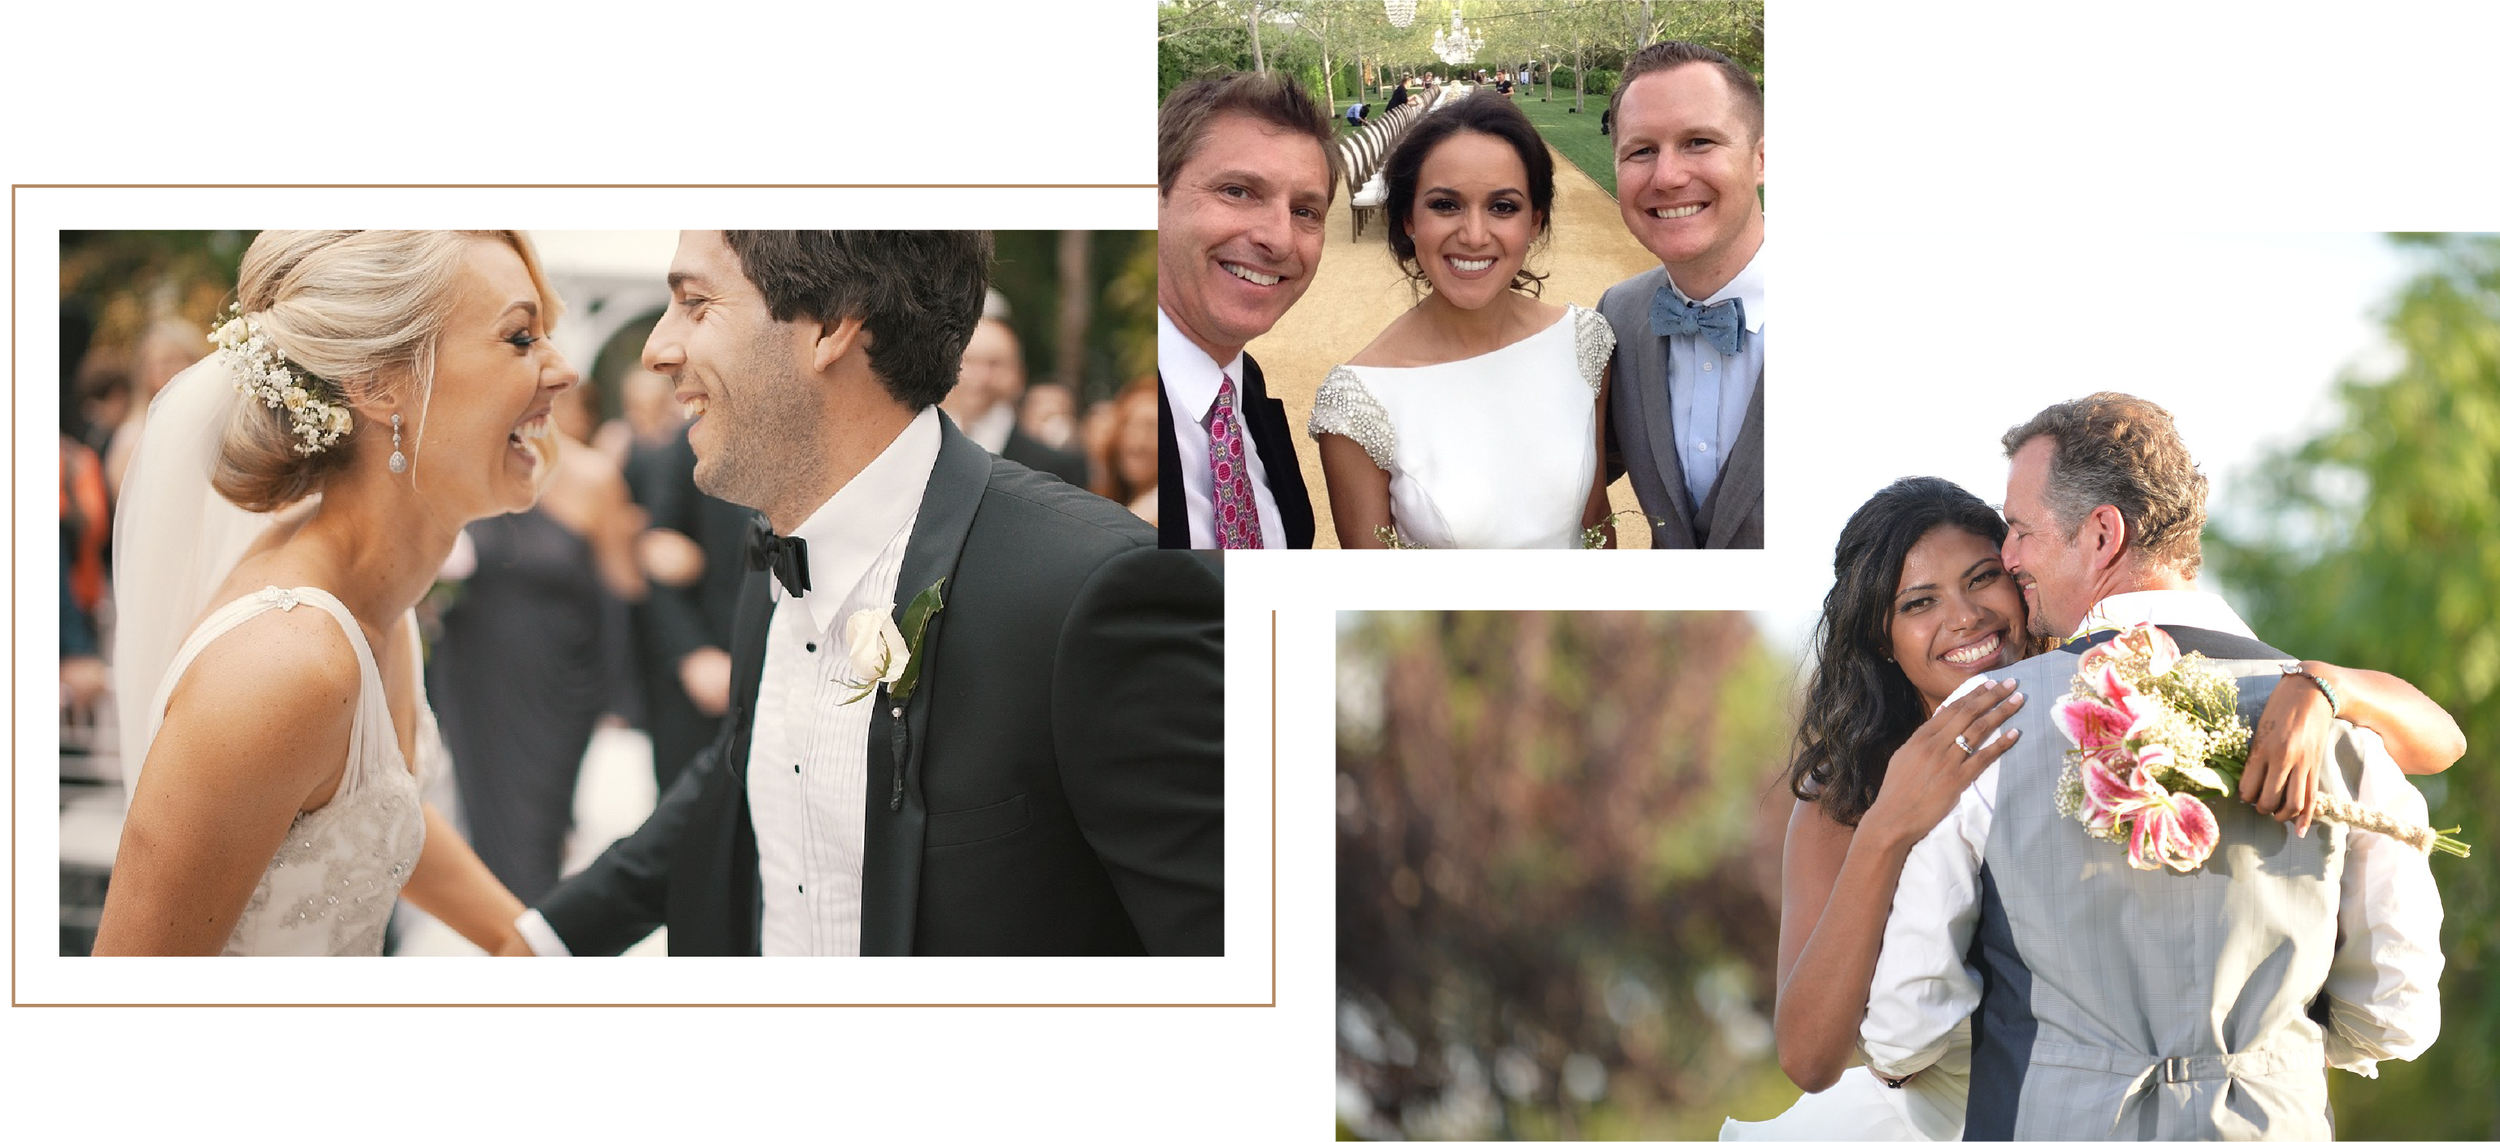 Santa Barbara Wedding DJs: Montecito wedding and event DJs